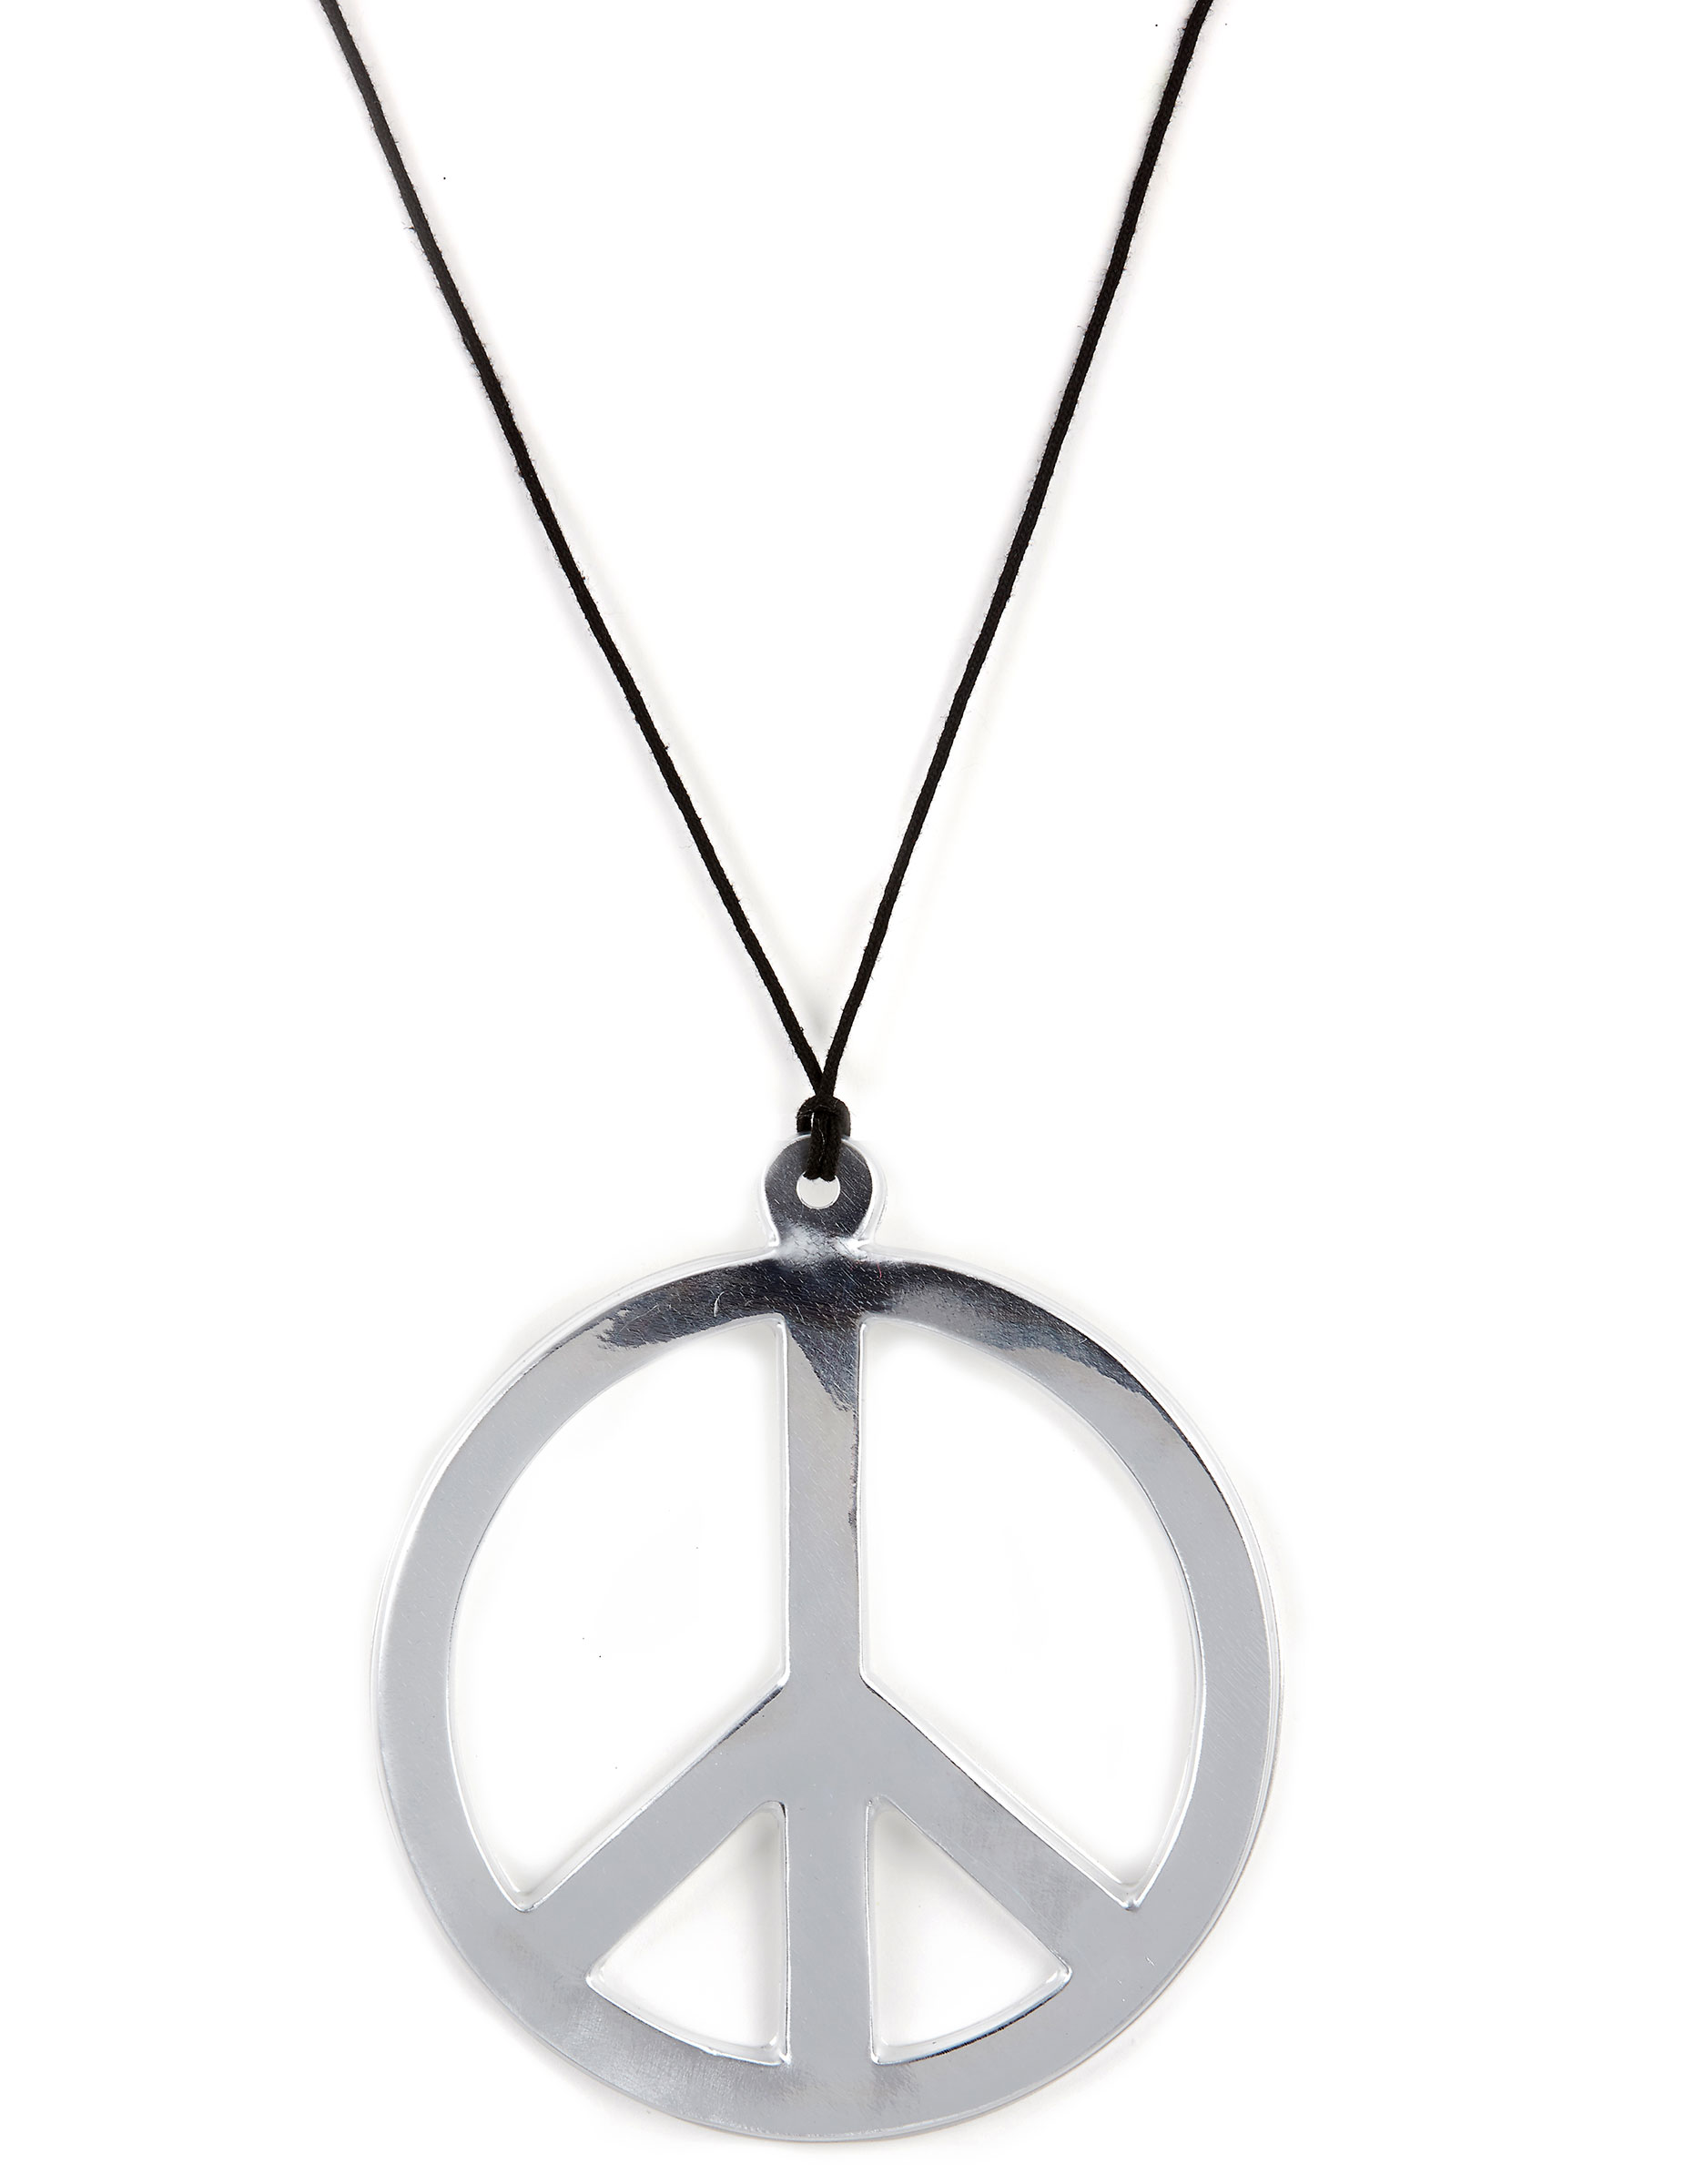 hippie kette peace kette silber g nstige faschings. Black Bedroom Furniture Sets. Home Design Ideas